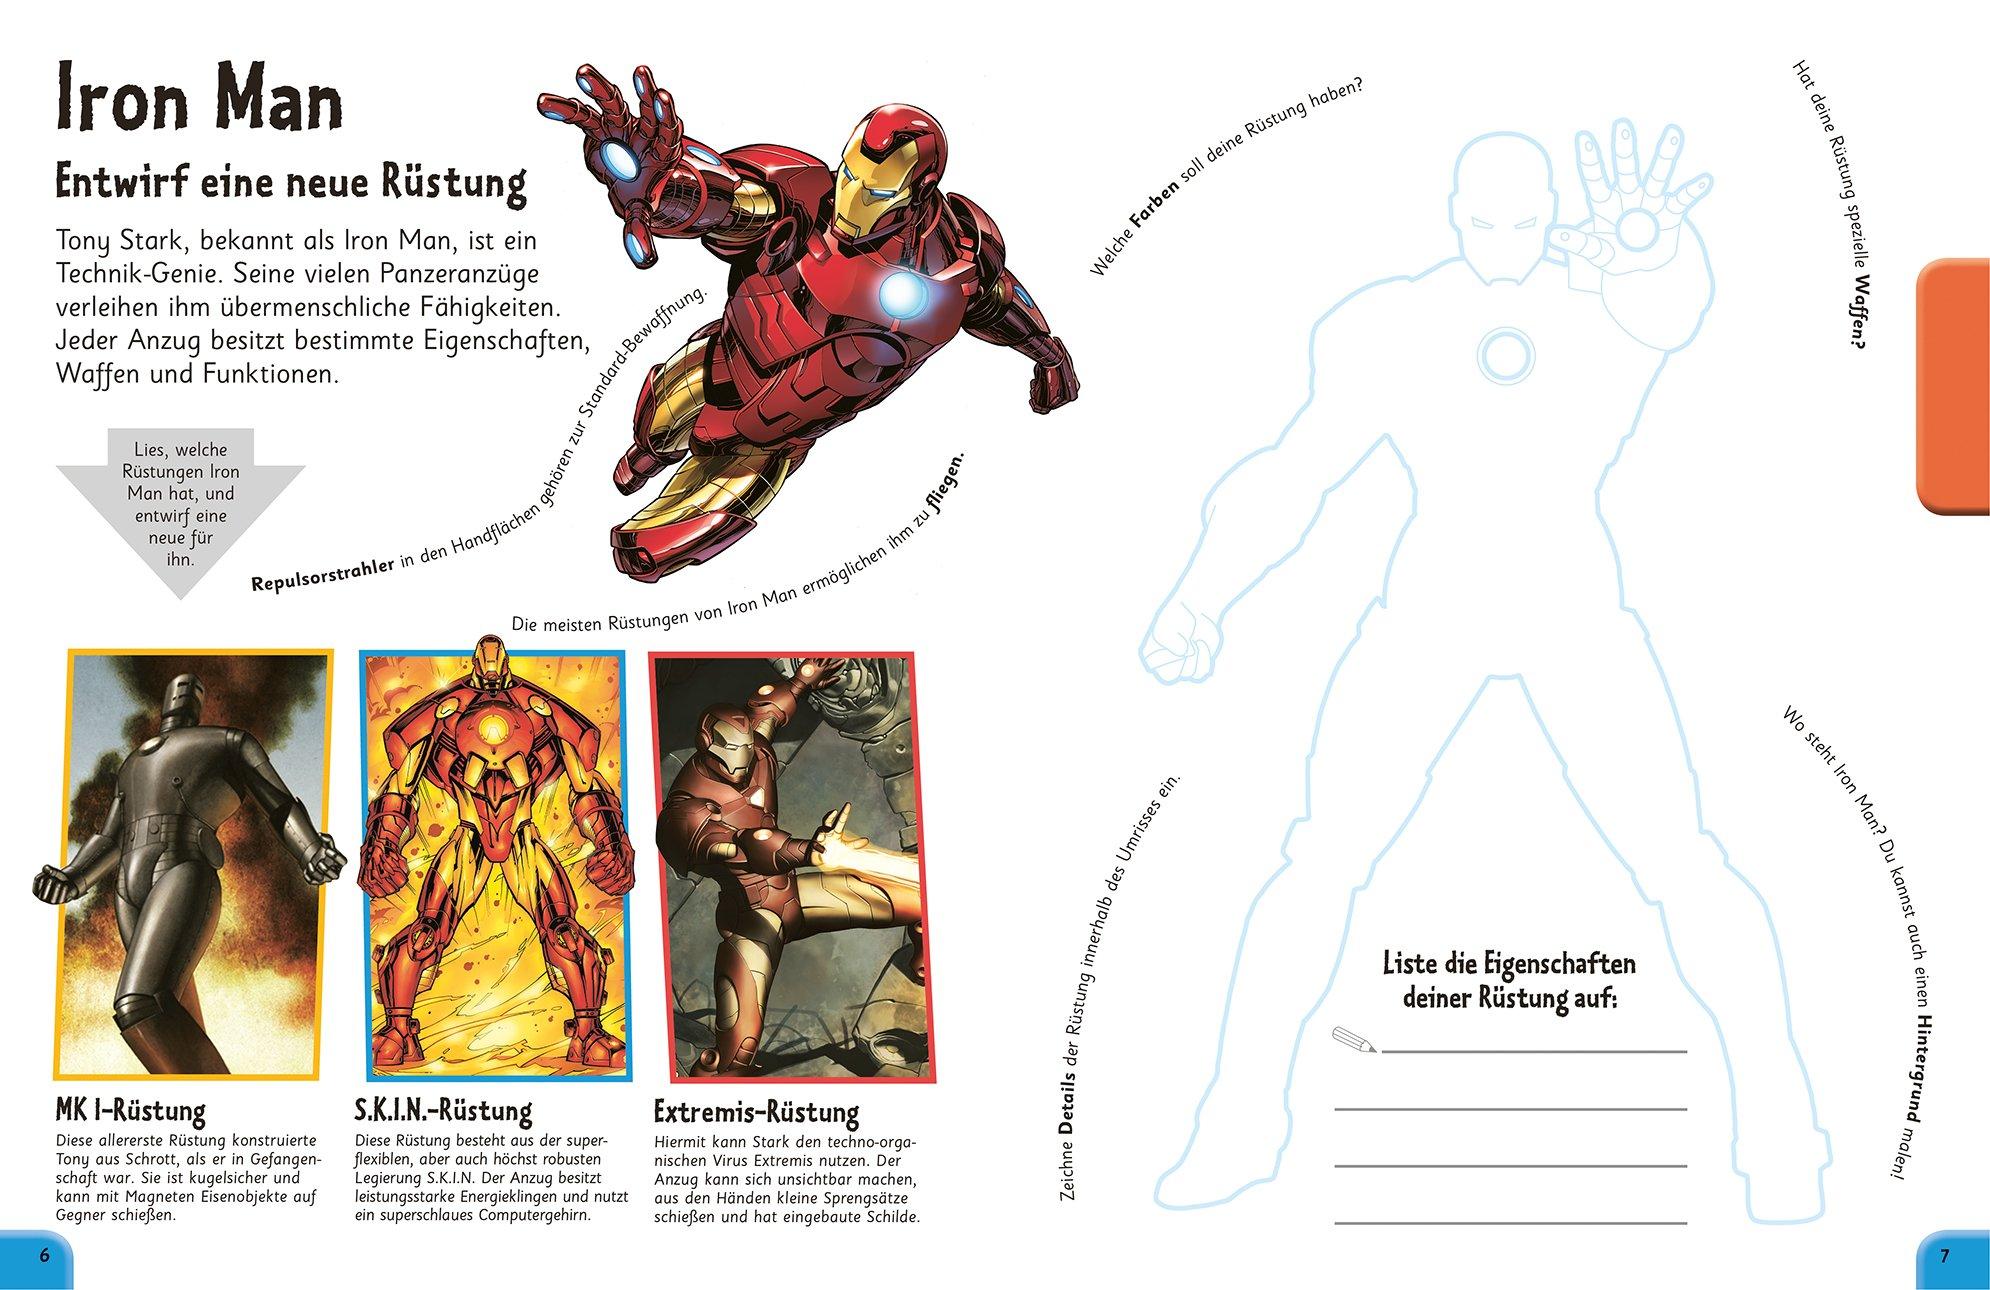 Das Mach-Malbuch Marvel Avengers: 9783831030217: Amazon.com: Books